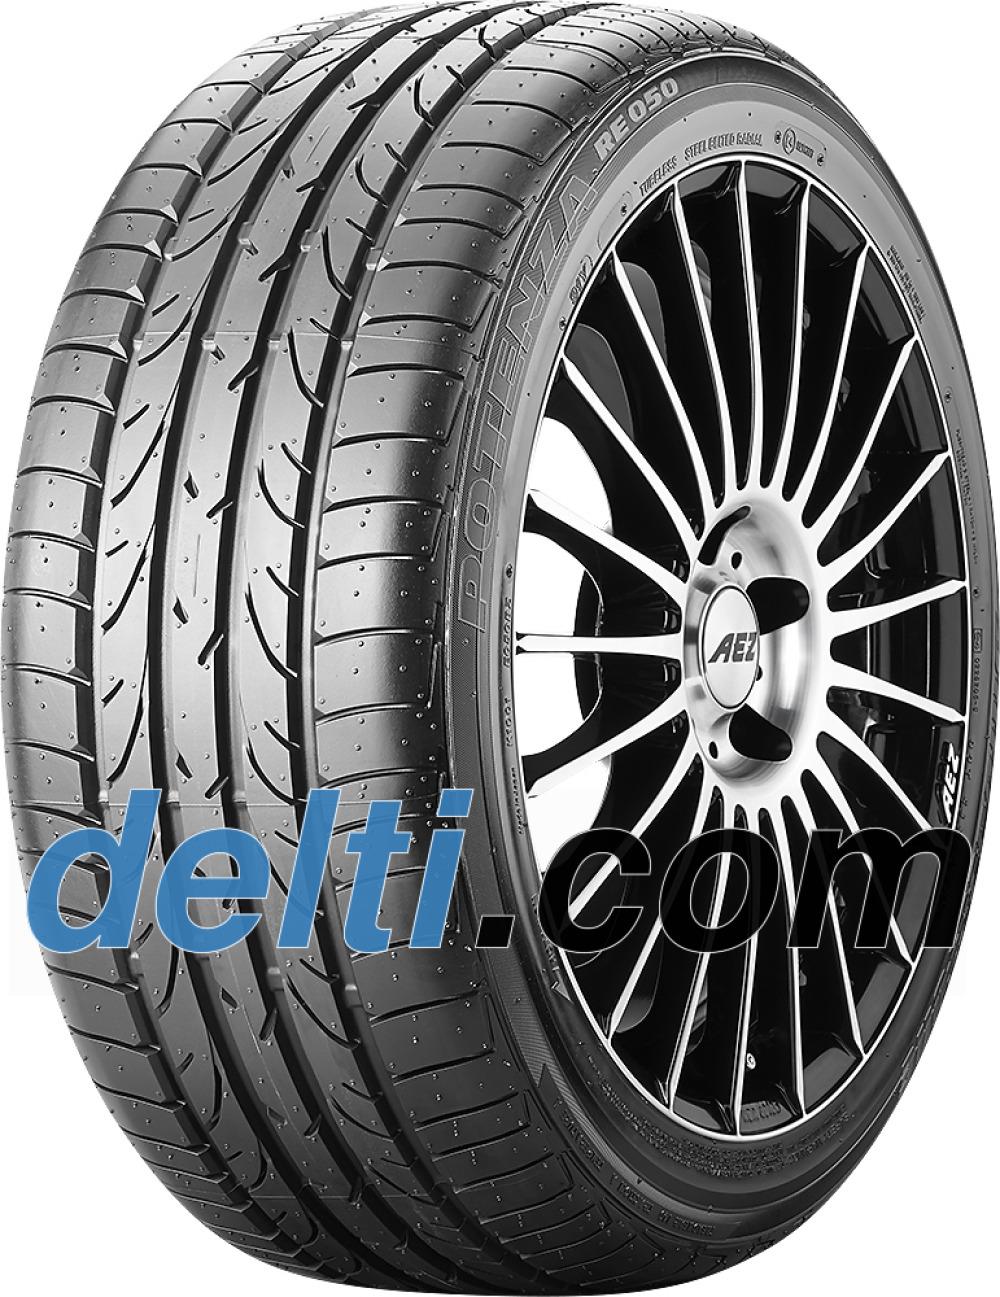 Bridgestone Potenza RE 050 ( 245/45 R18 100Y XL med felgbeskyttelse (MFS) )